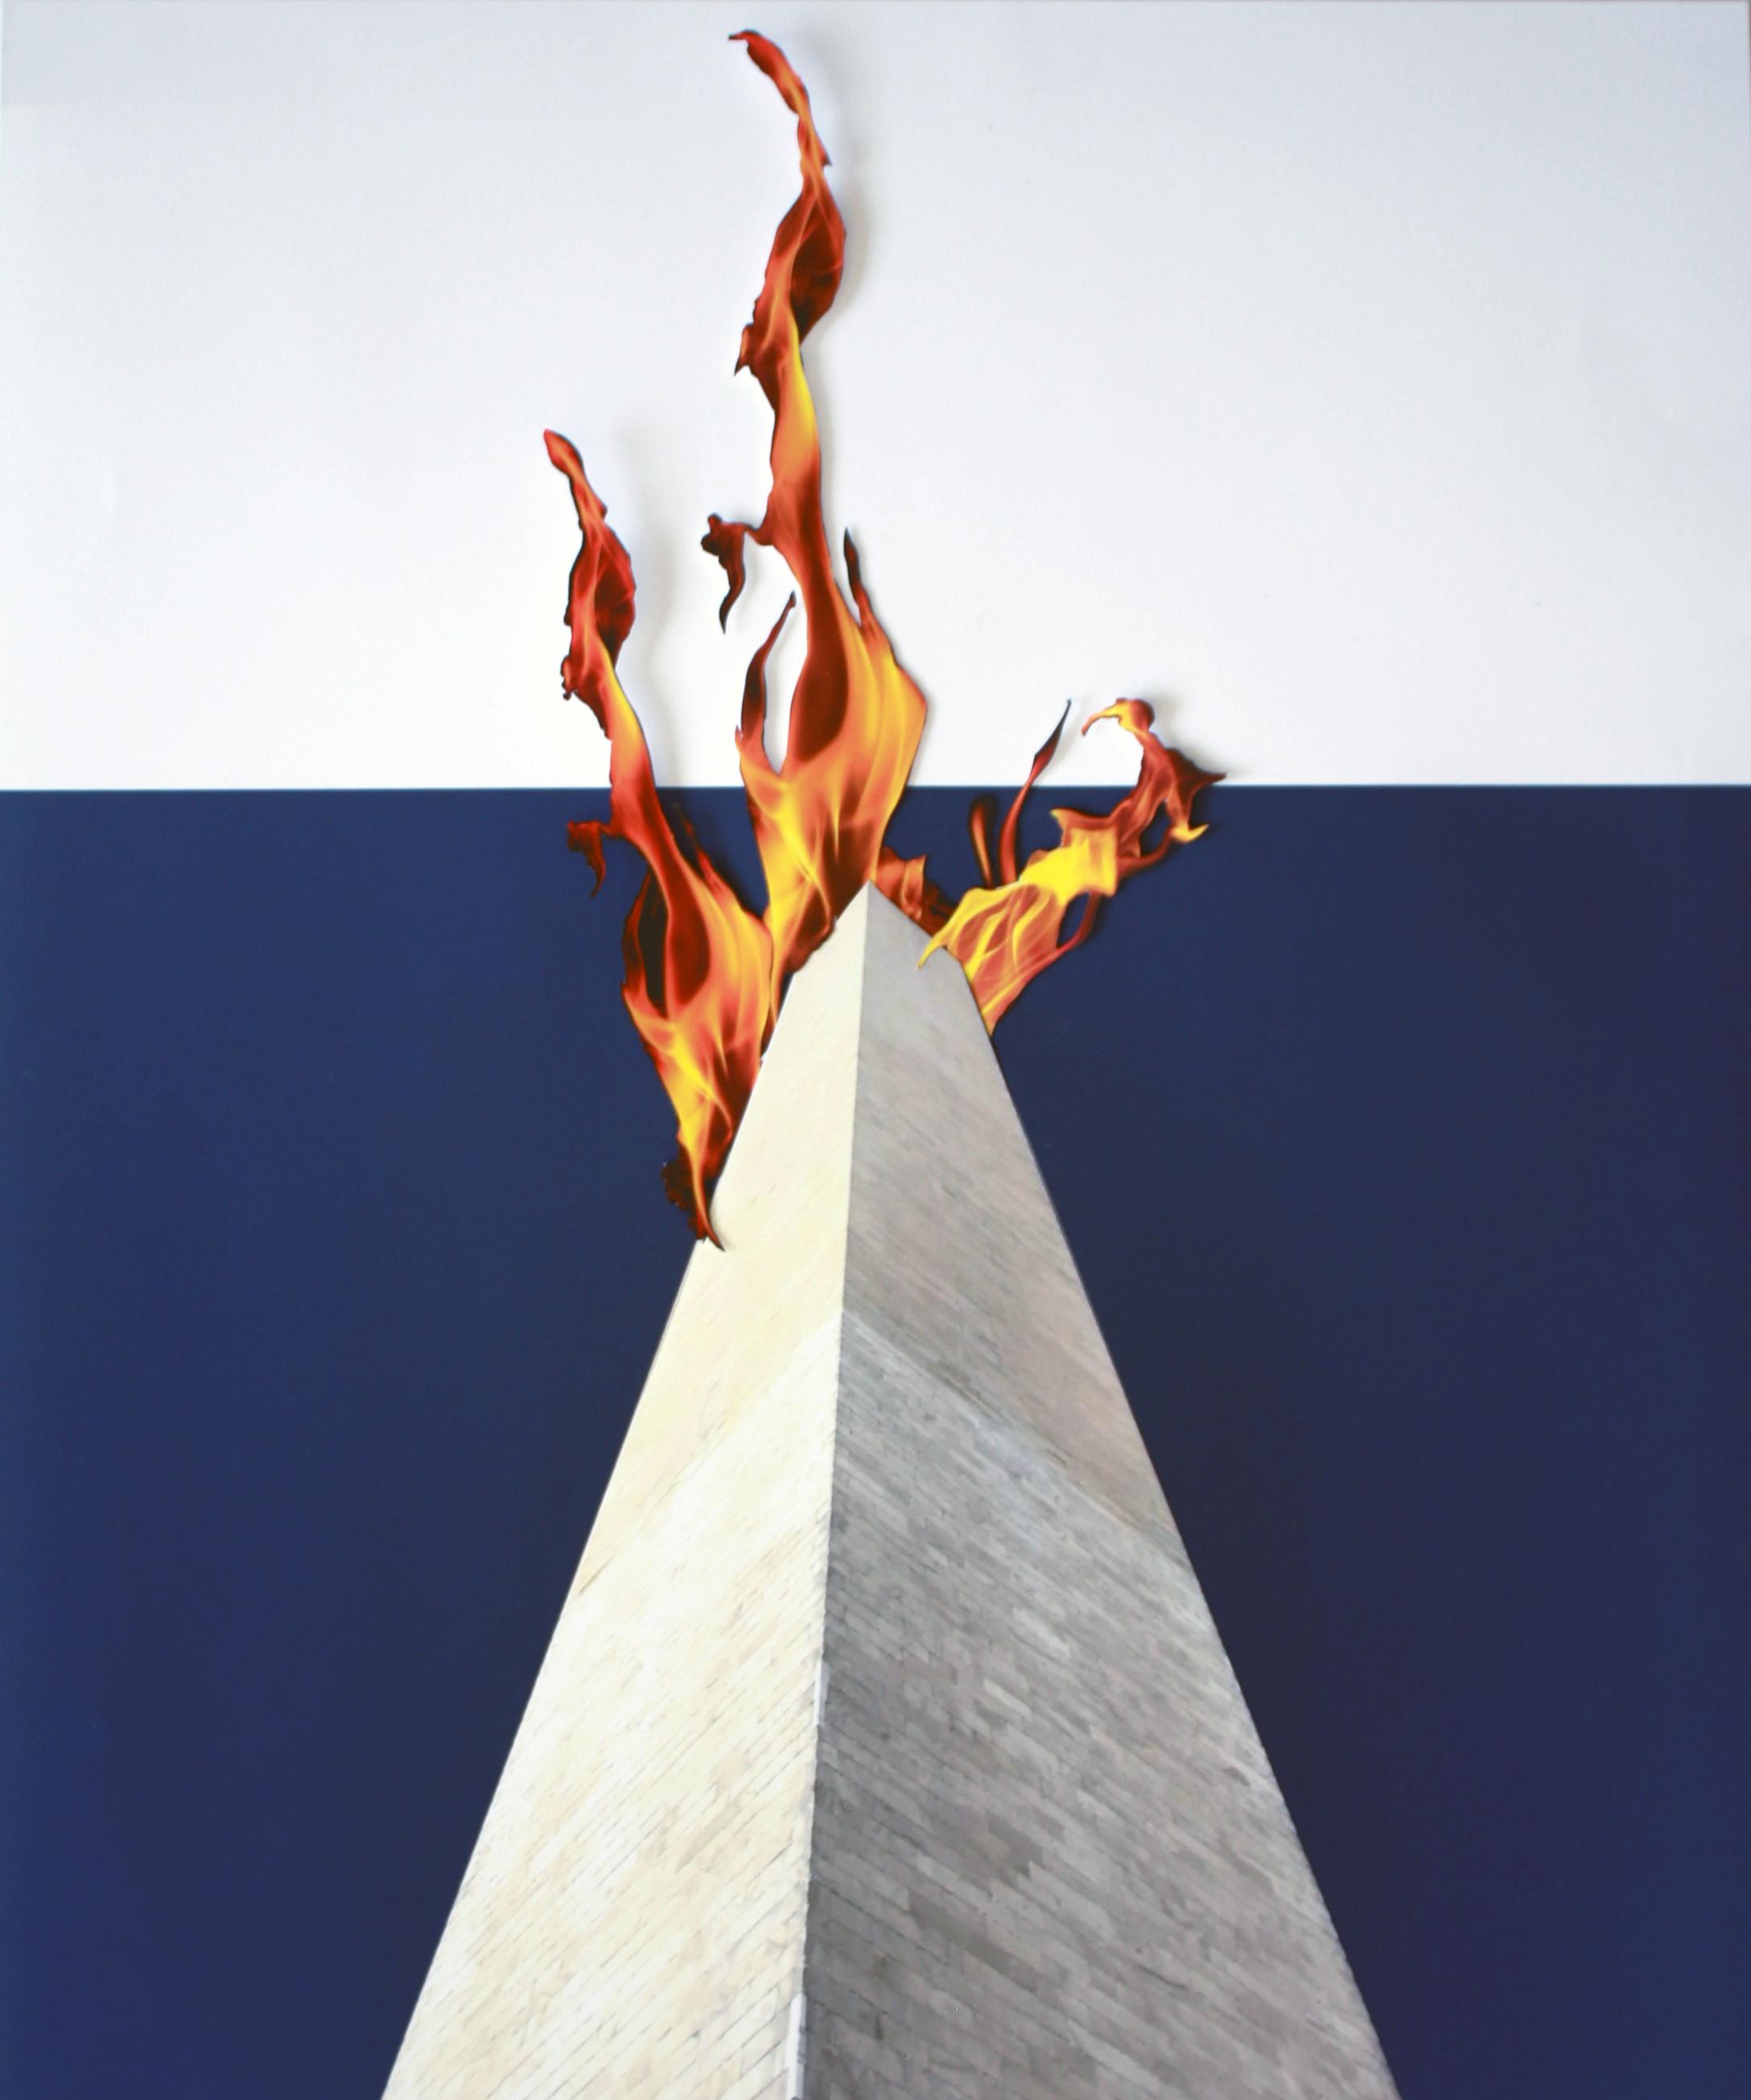 Monument on Fire (Washington)